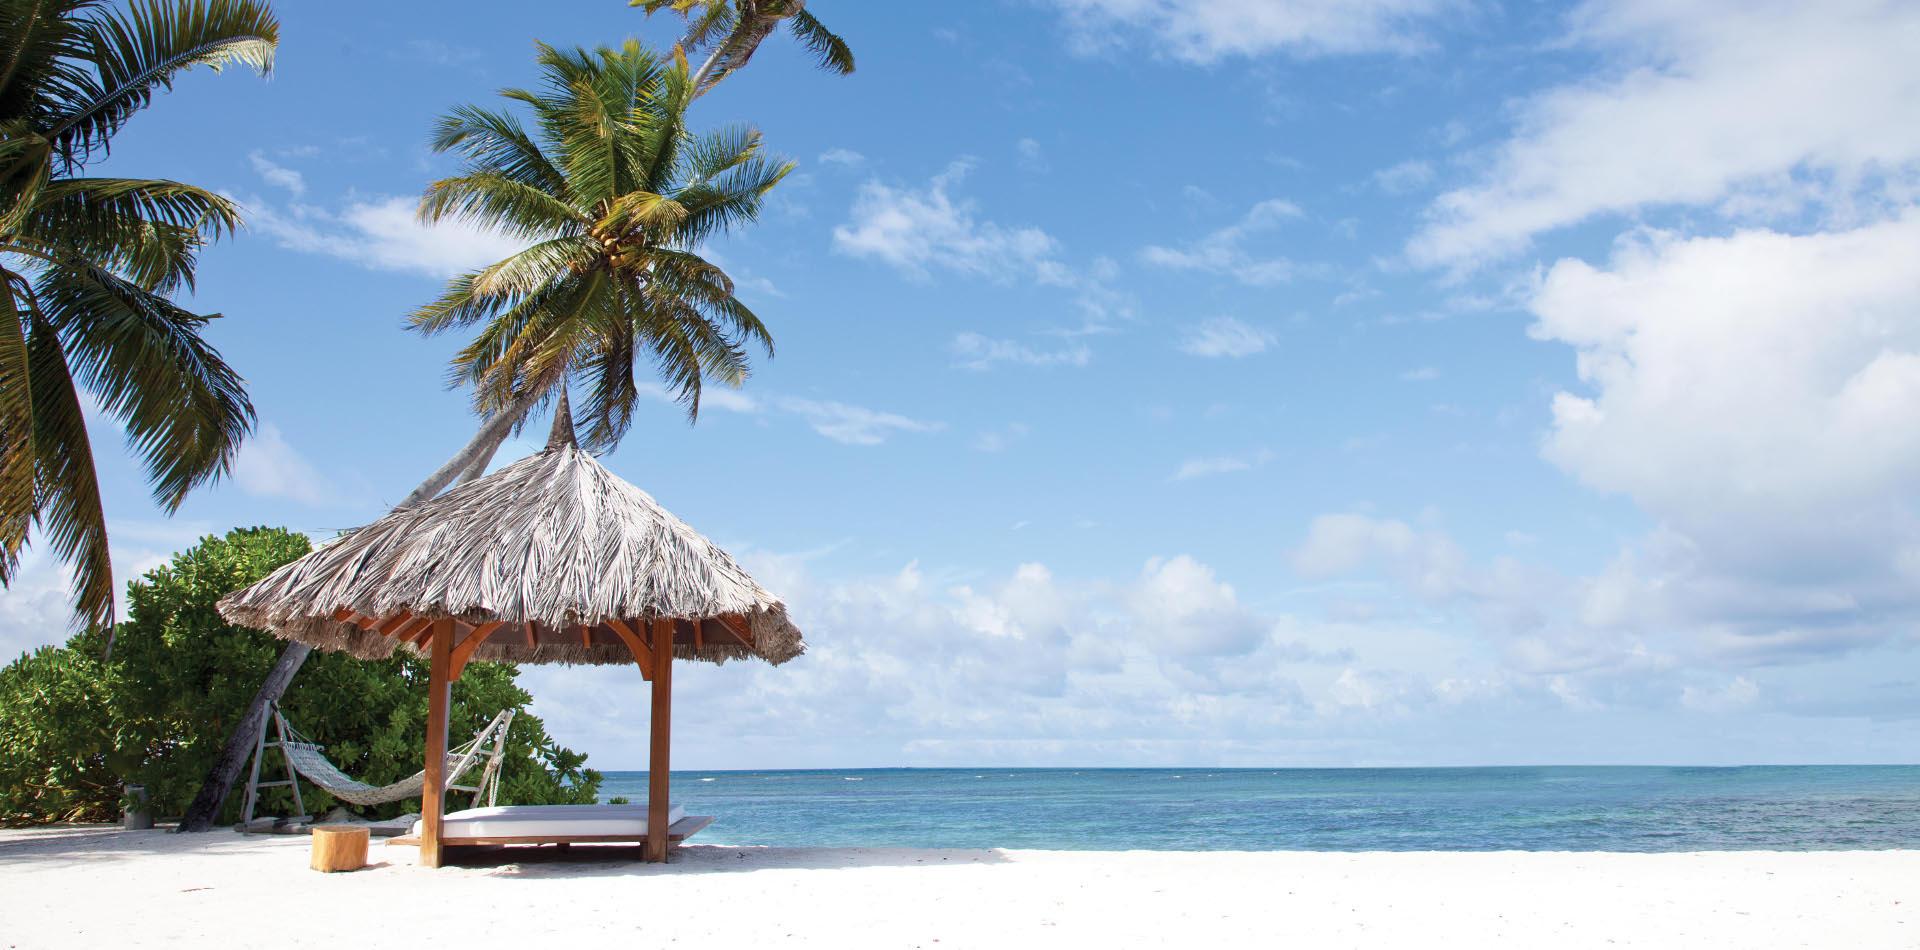 Banyan Tree Seychelles, Luxushotel Seychellen, Luxusreise Seychellen